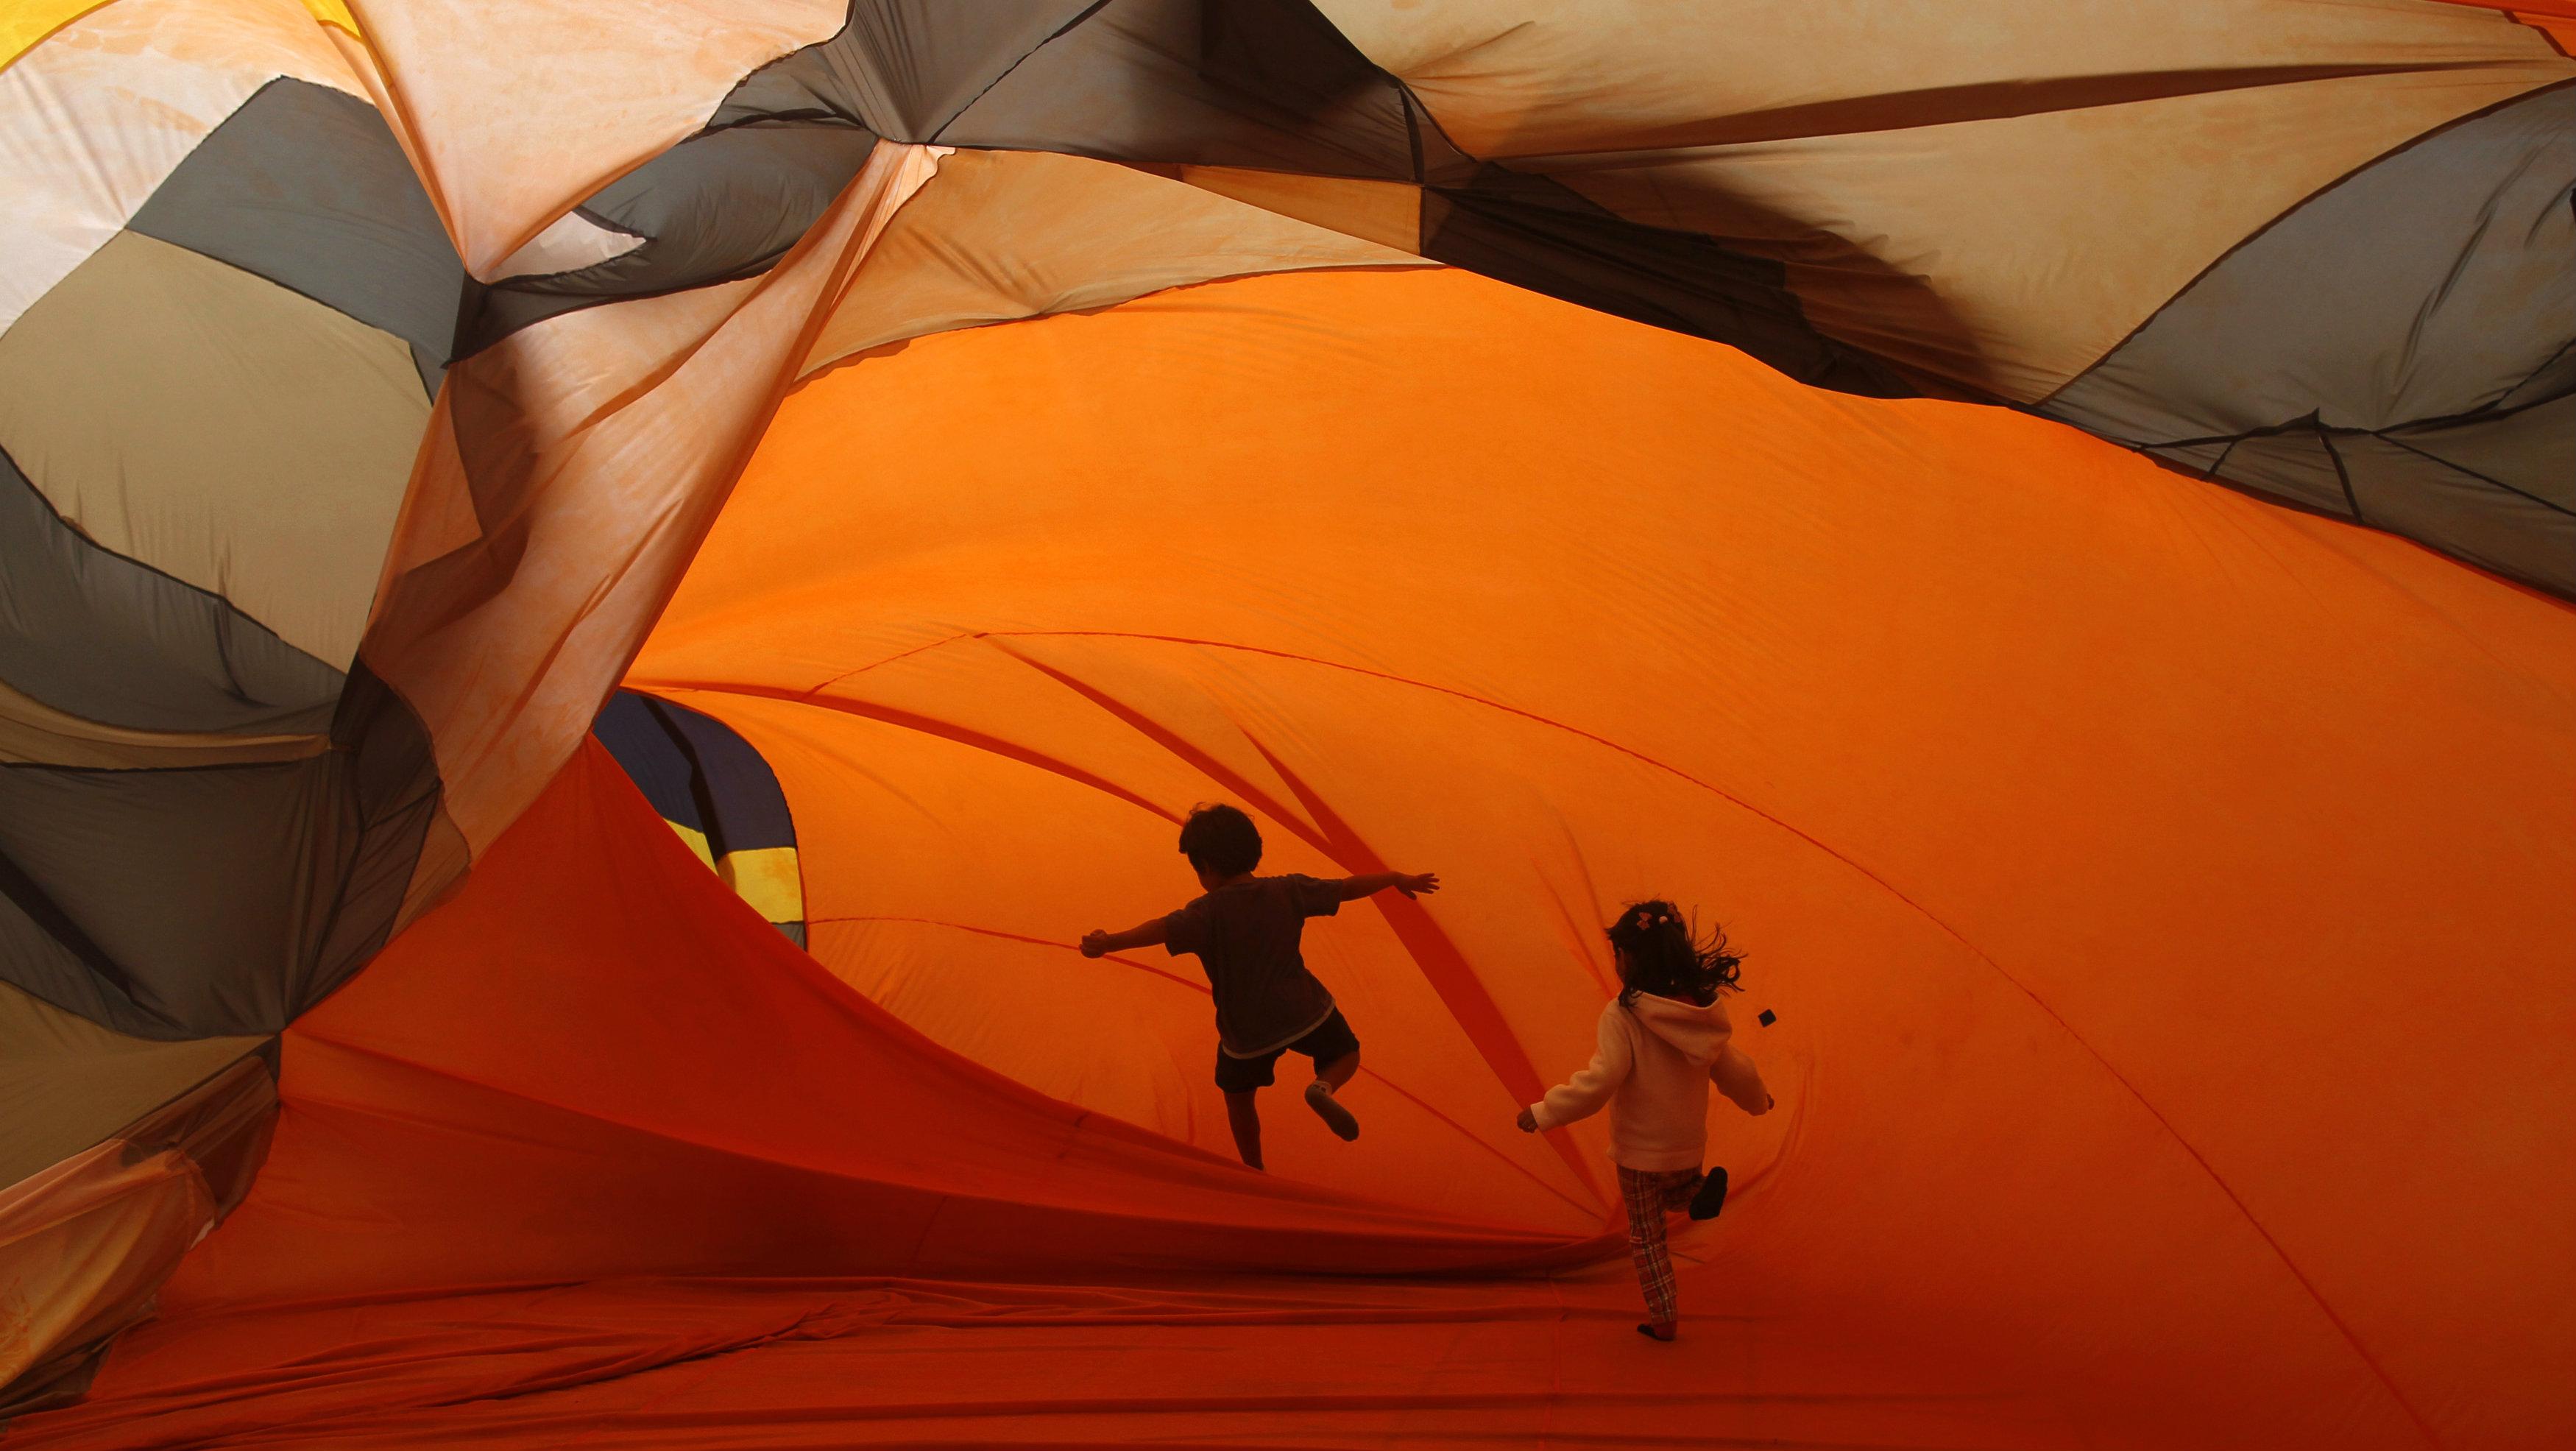 Children play inside inflatable installations at the Casa Daros museum in Rio de Janeiro September 29, 2013. REUTERS/Pilar Olivares